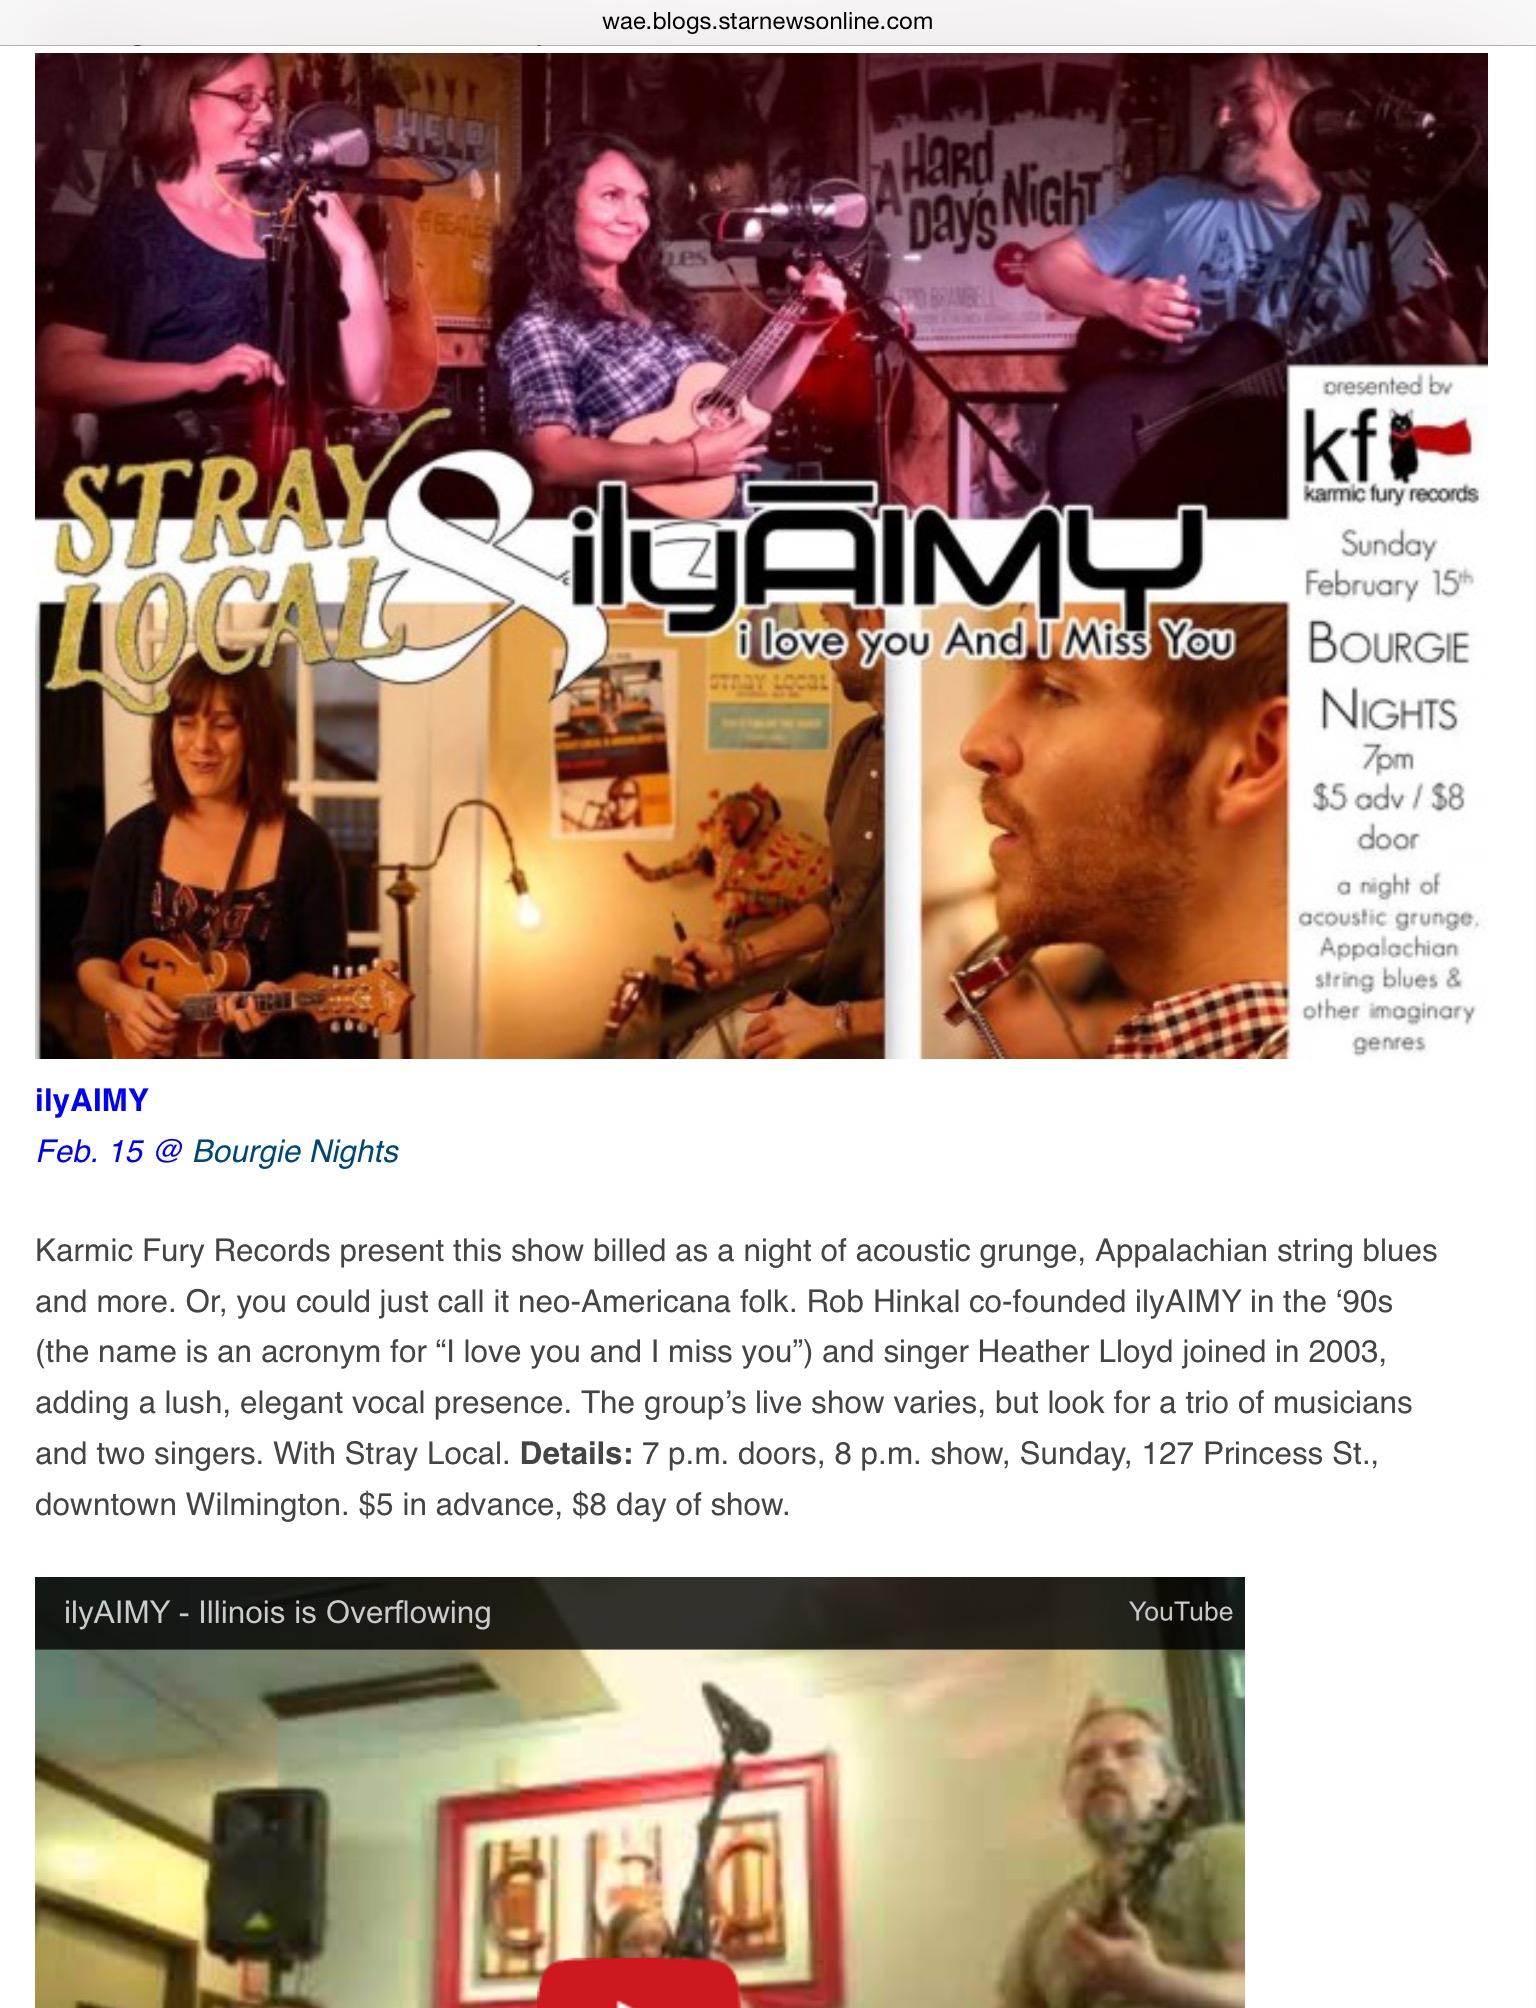 ilyaimy and karmic fury records in star news